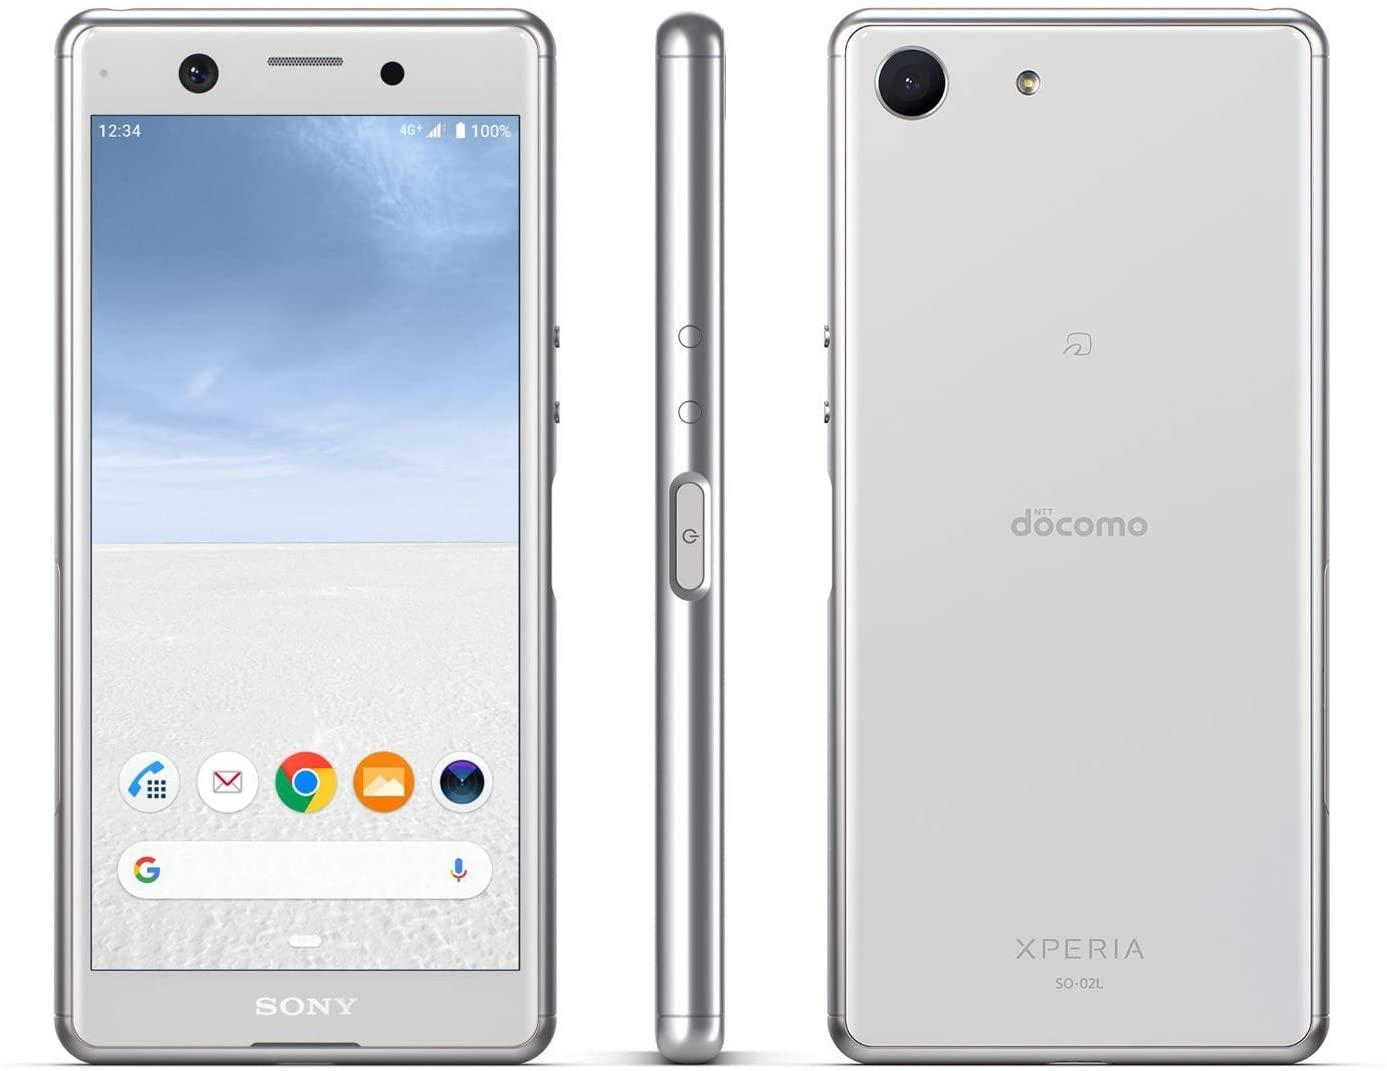 Xperia Ace Snapdragon 630 SDM630 2.2GHz 8コア